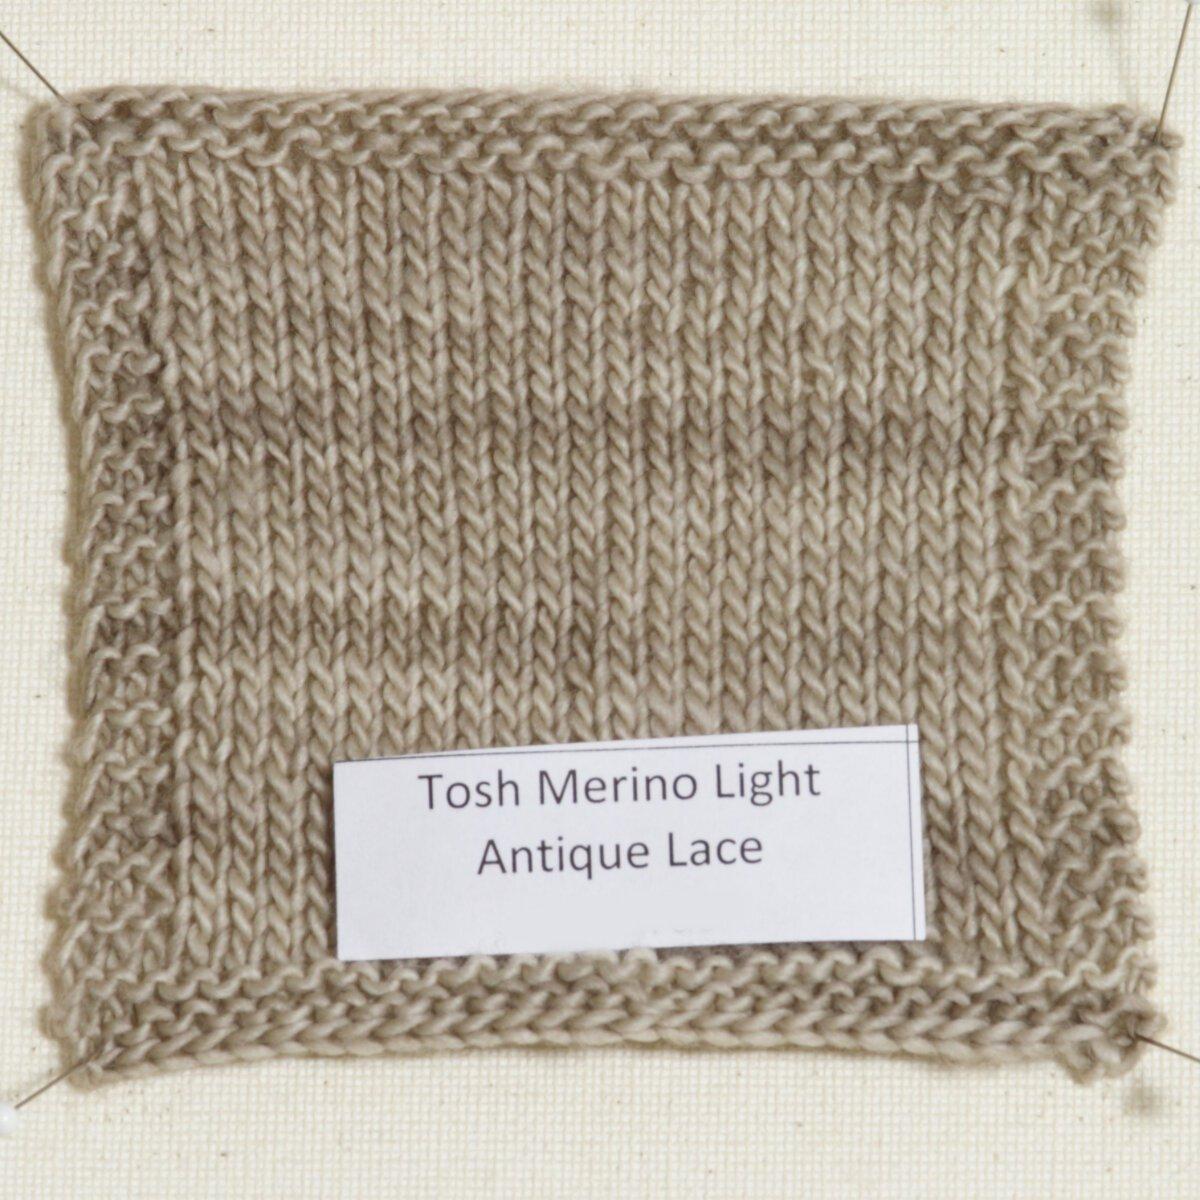 madelinetosh tosh merino light yarn antique lace reviews. Black Bedroom Furniture Sets. Home Design Ideas